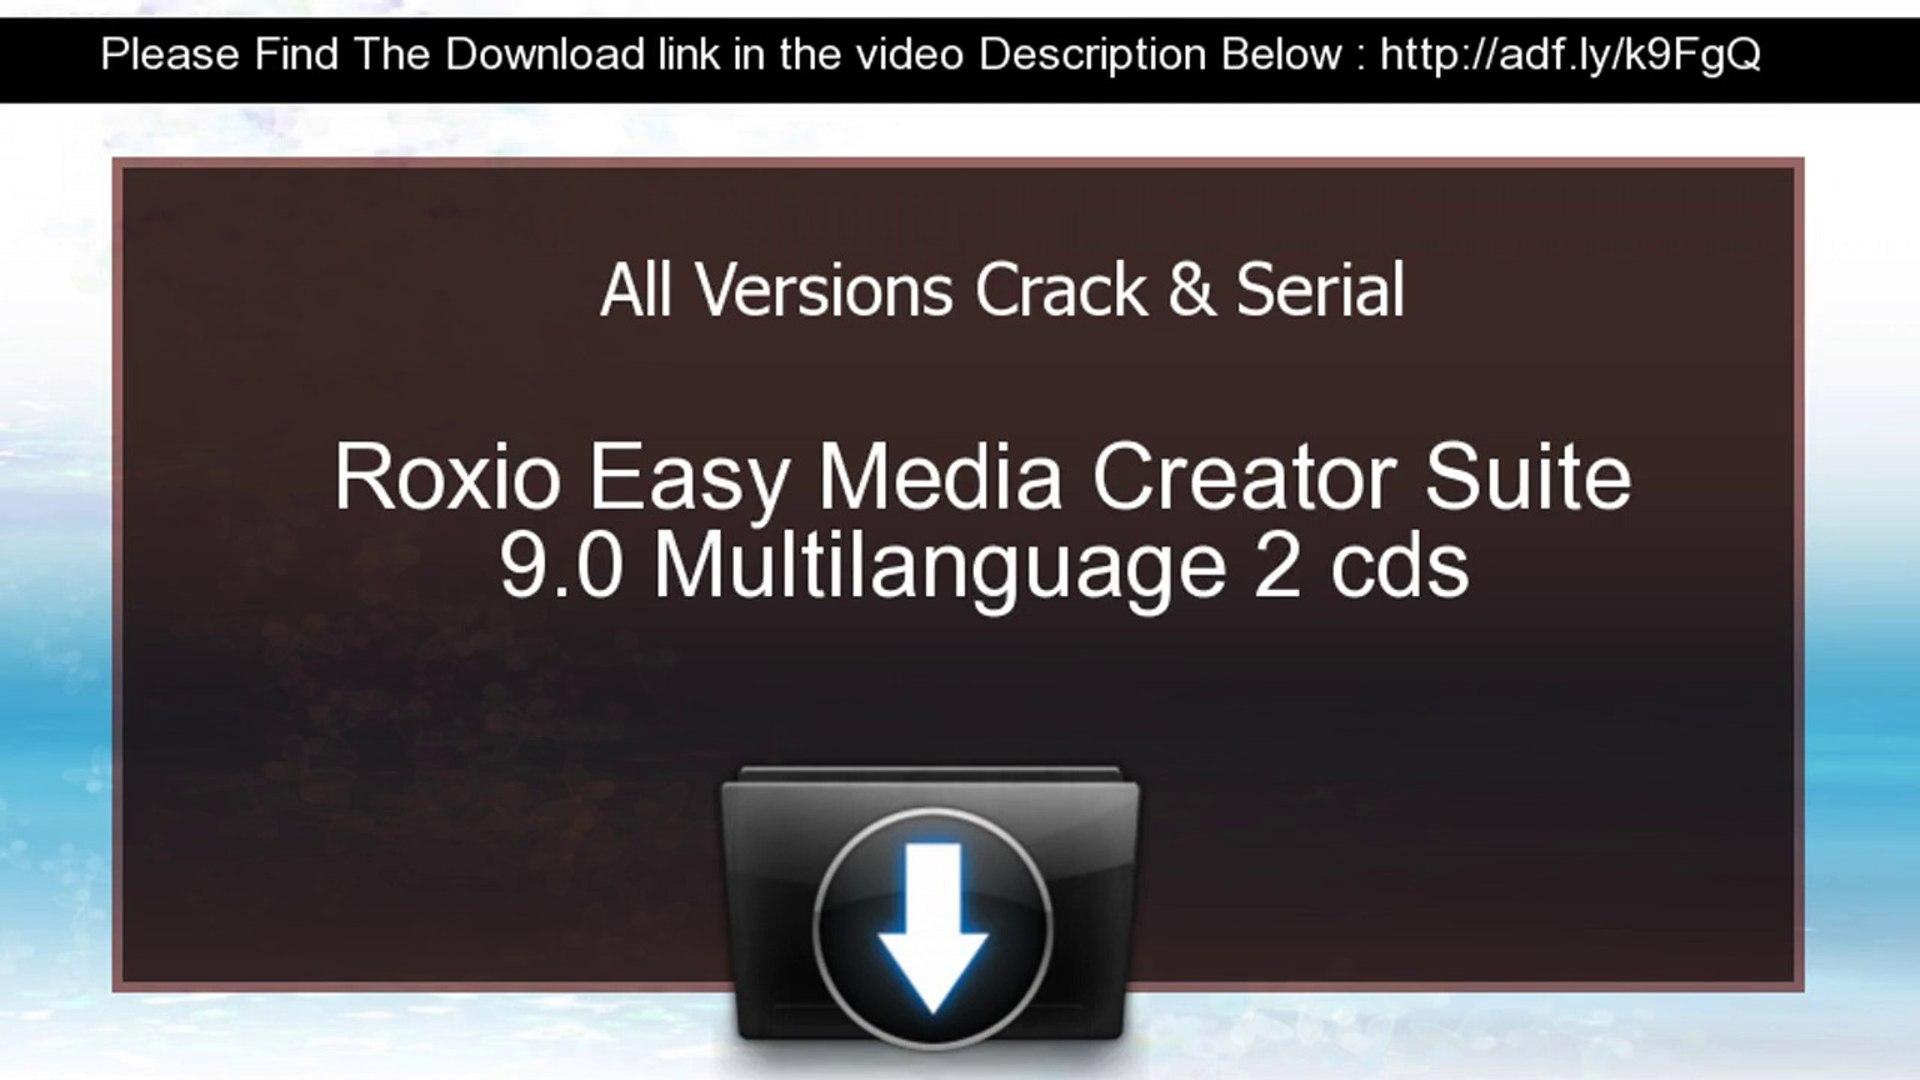 Crack de roxio easy media creator 9 suite freegraphics.